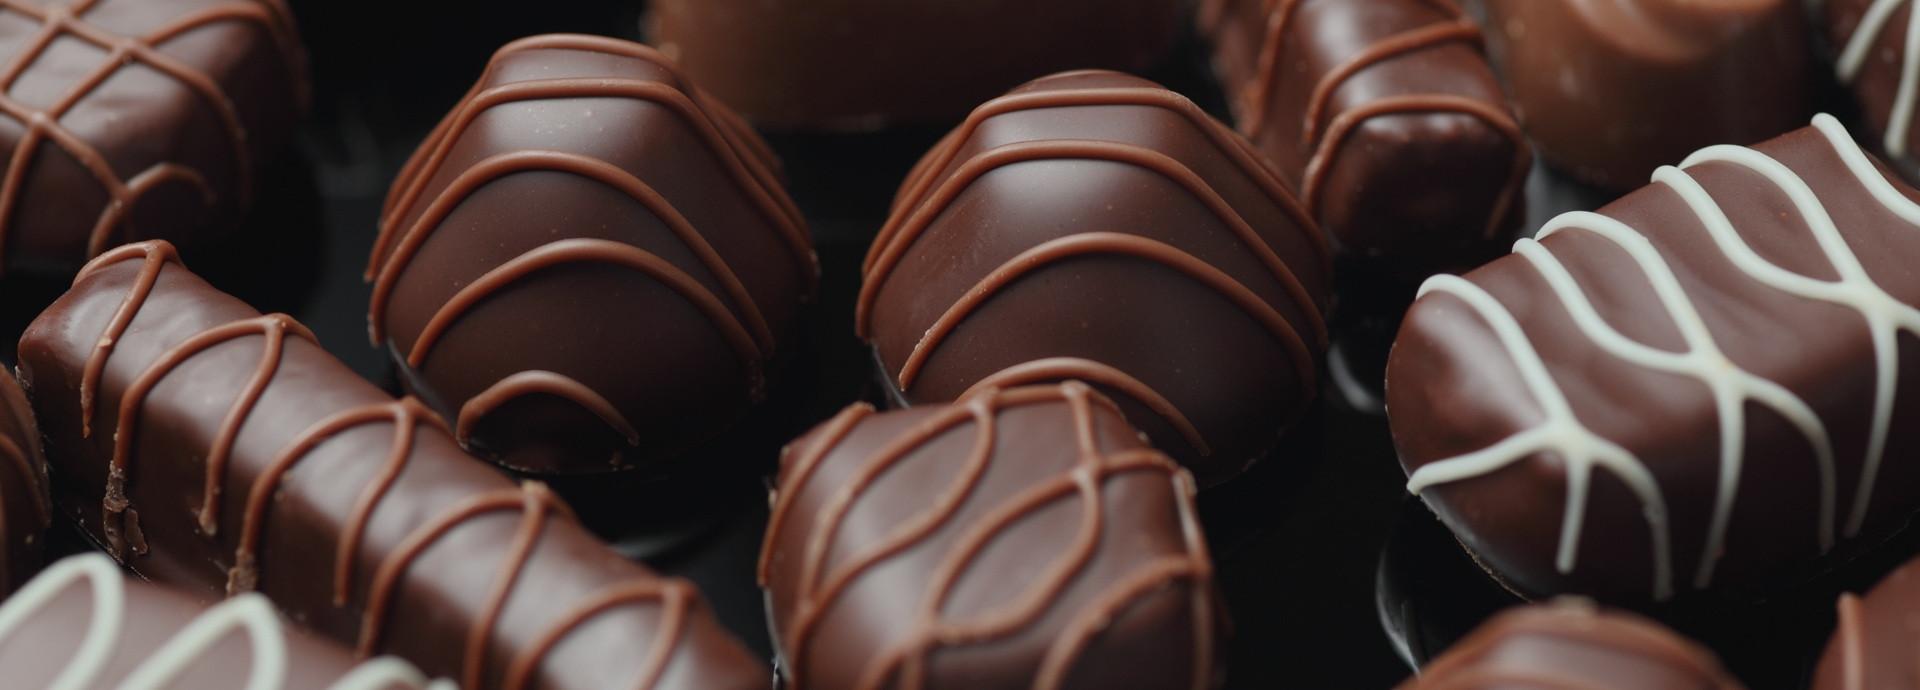 Chocolaterie du Vieux-Beloeil - Mai Champlain